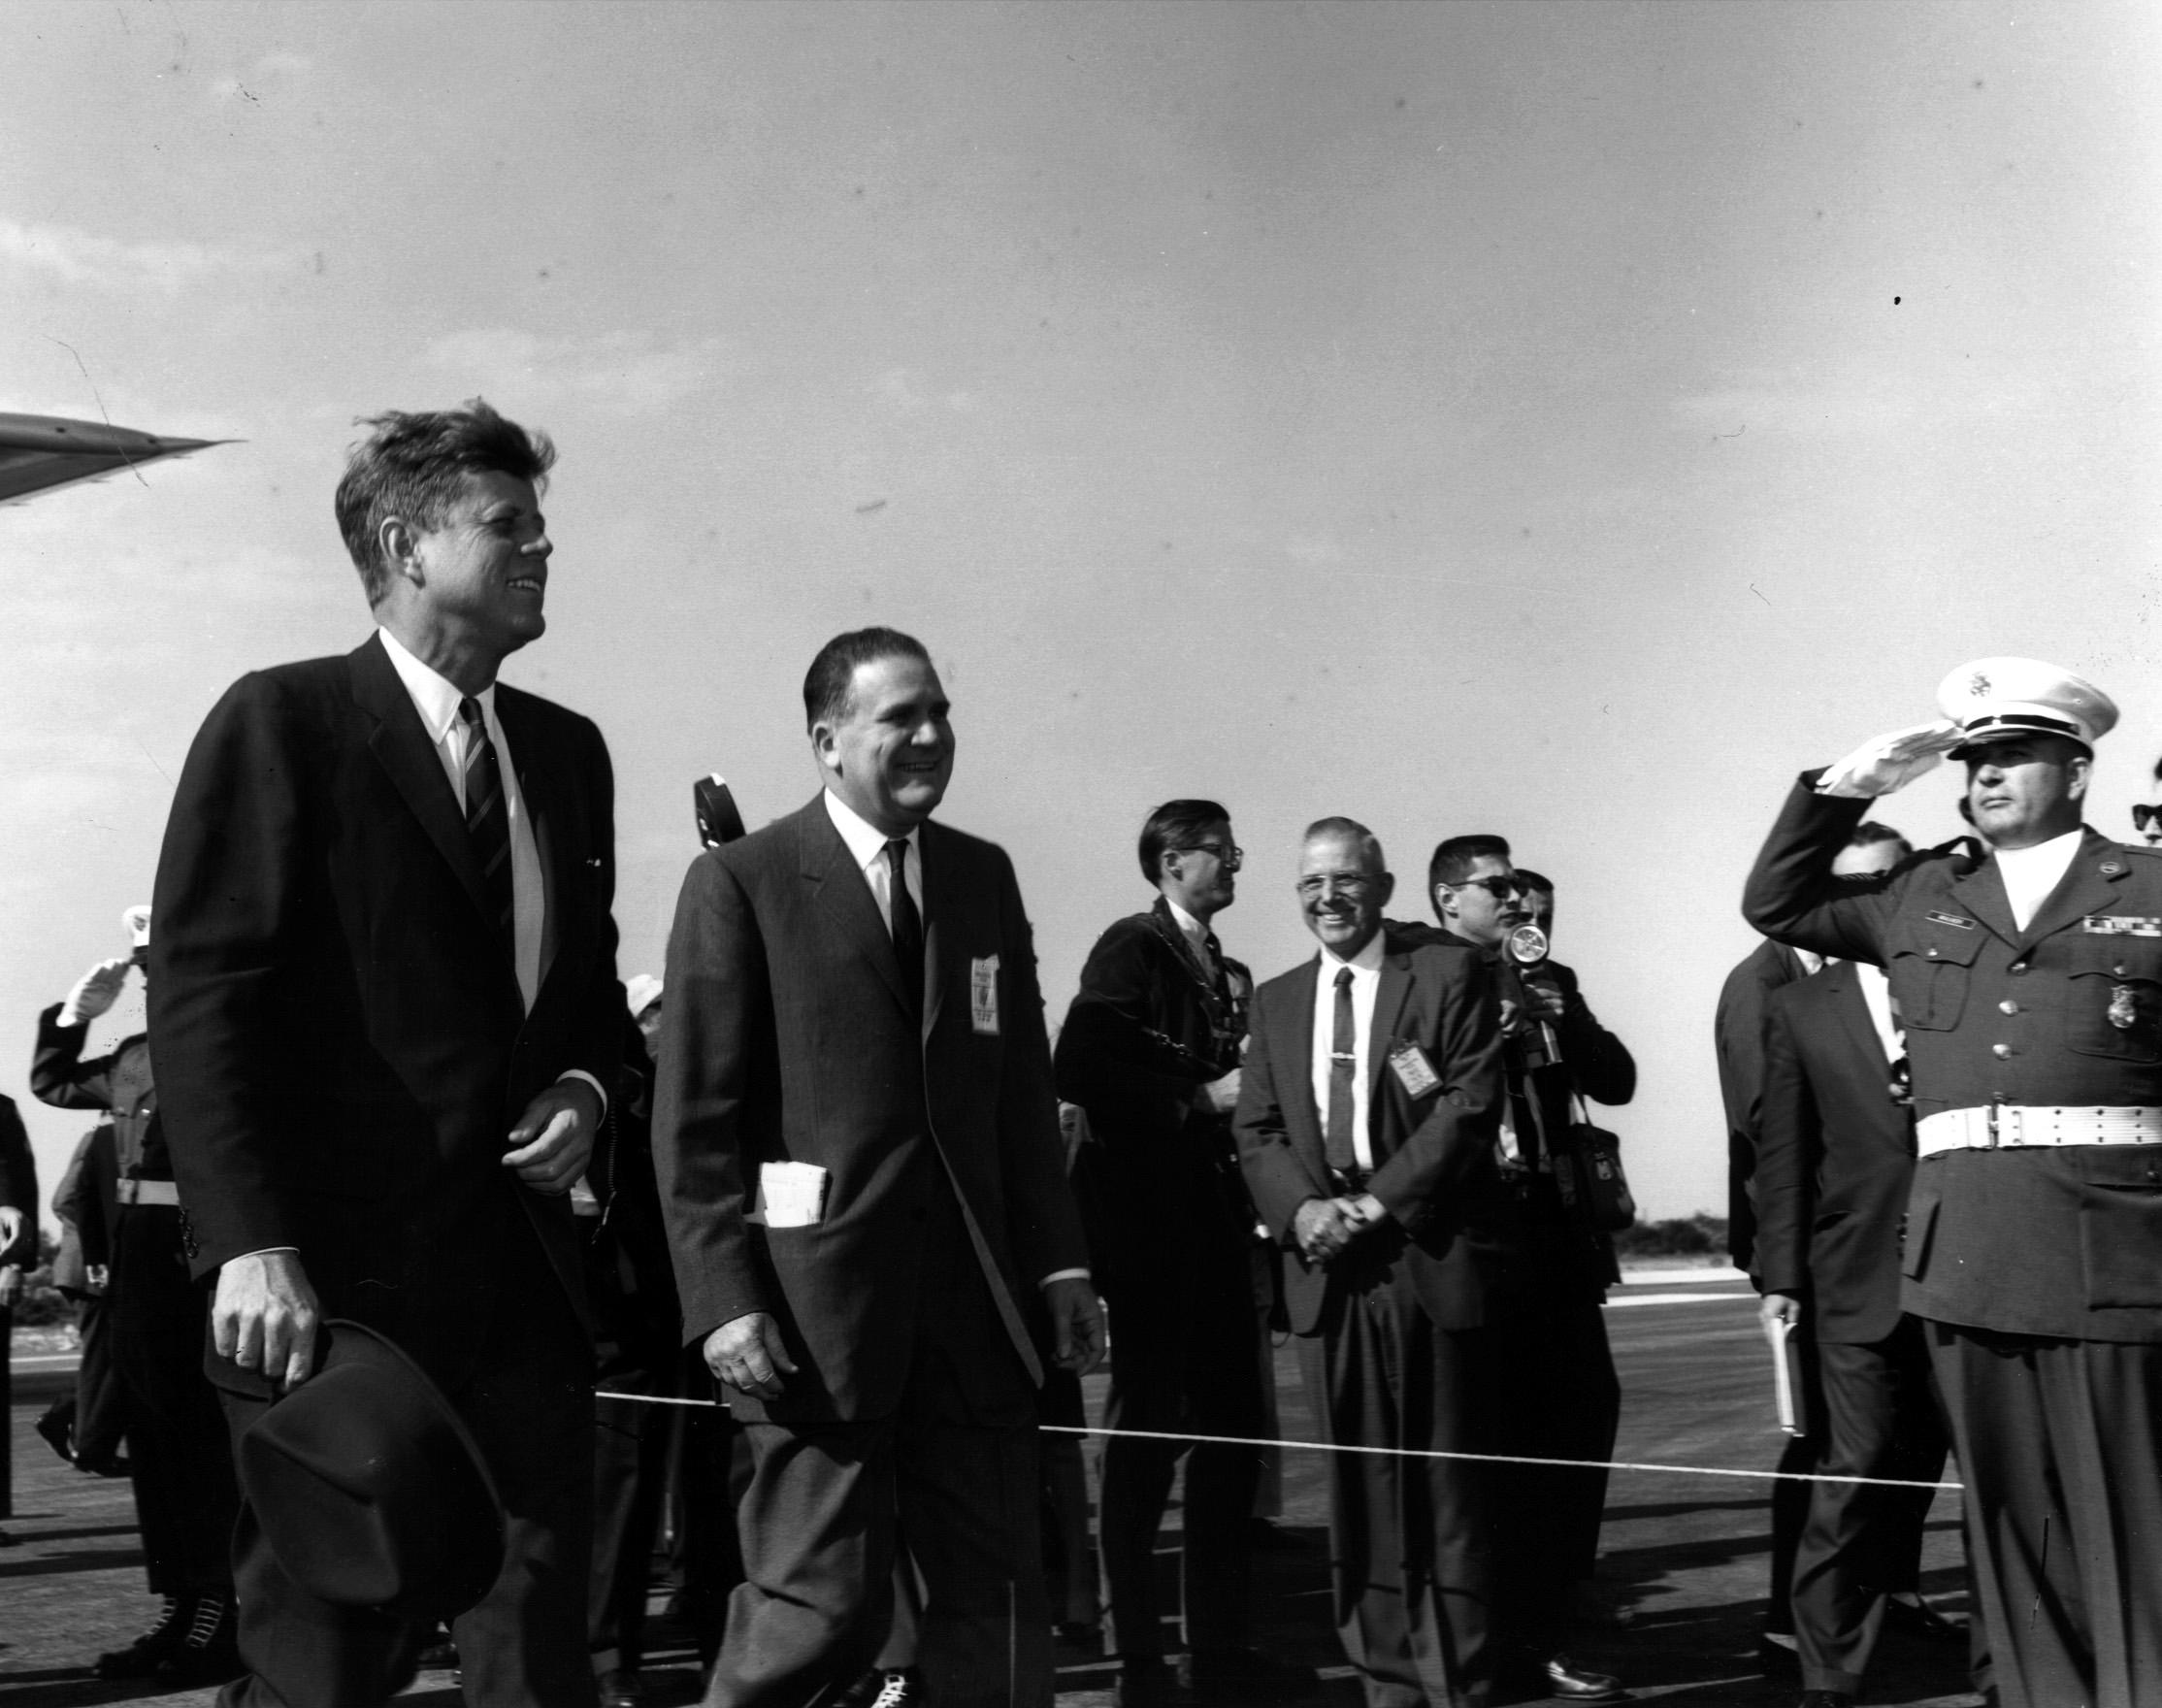 Webb and Kennedy